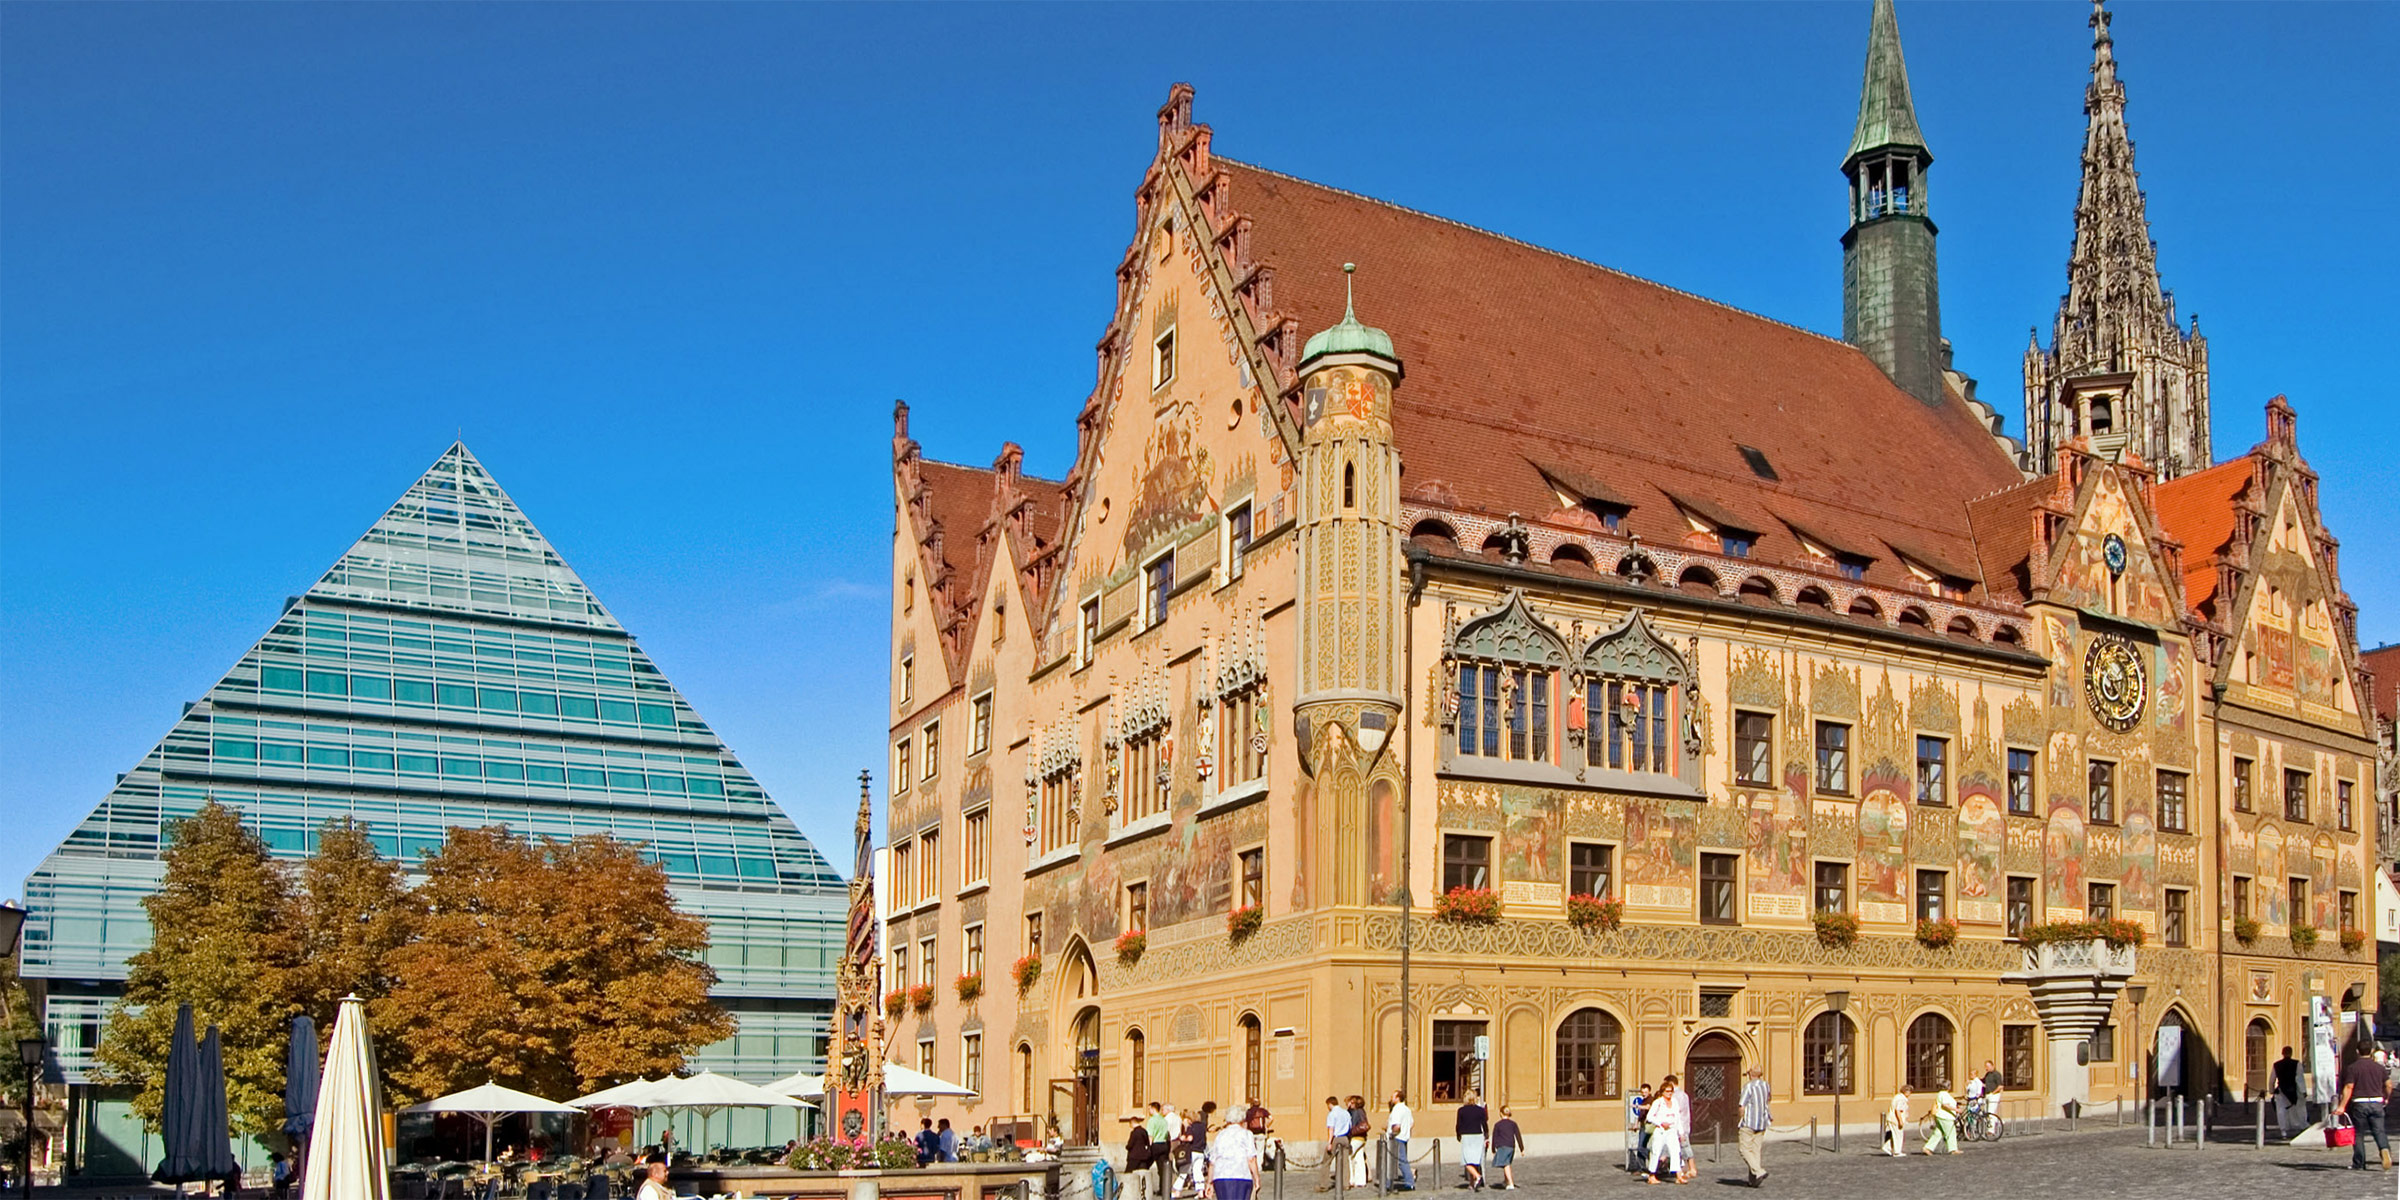 Ulm City Hall